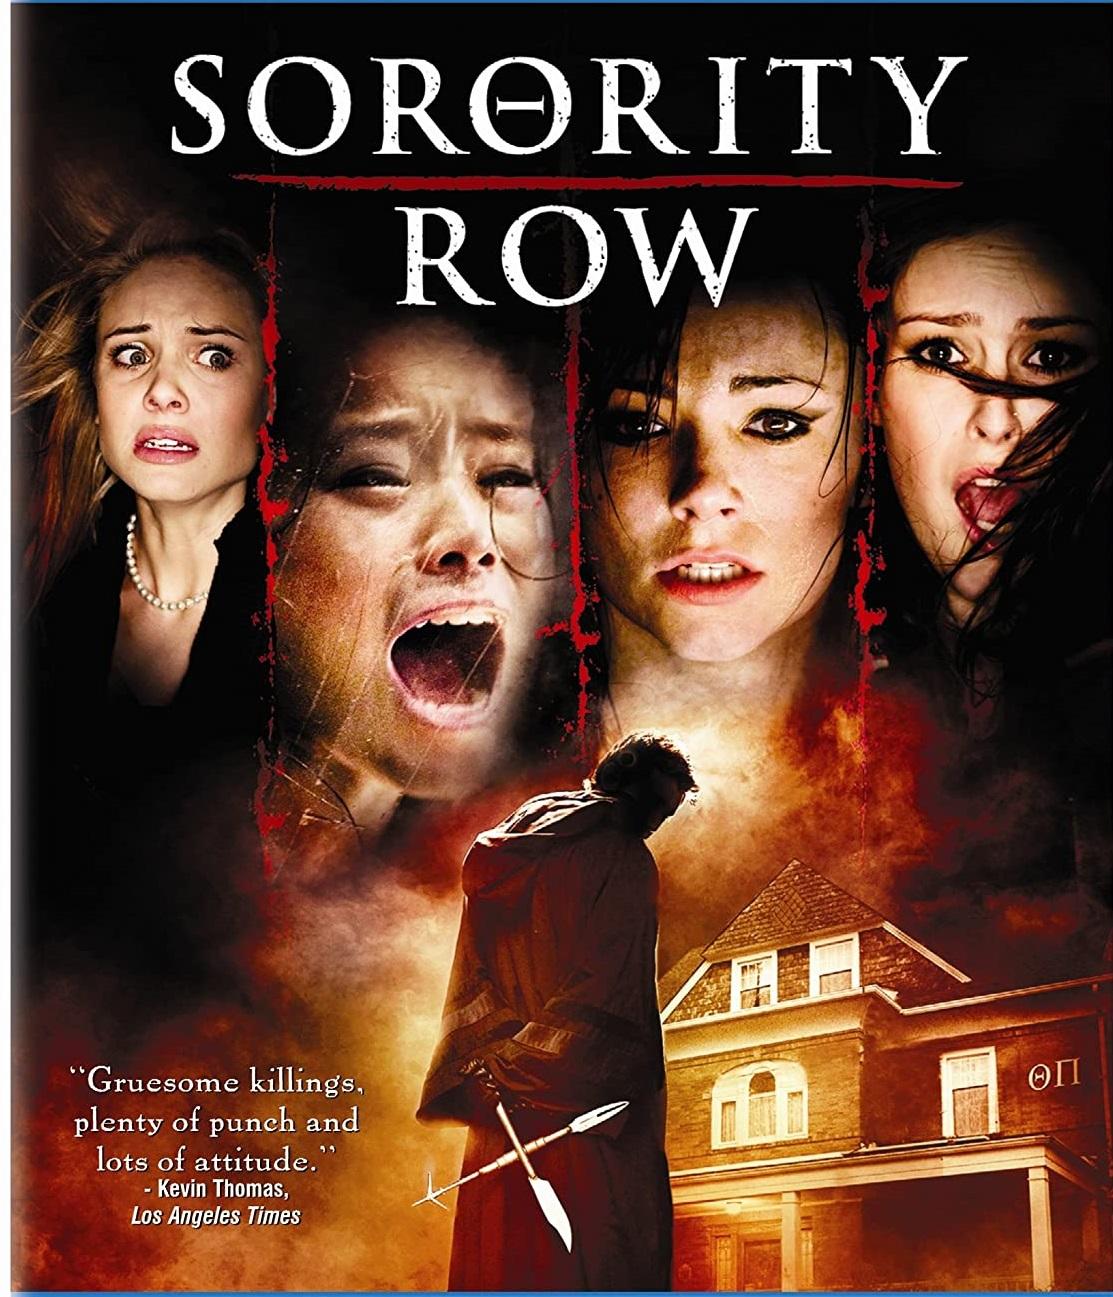 Sorority Row 2009 Hindi Dual Audio 720p BluRay ESubs 1.4GB Download